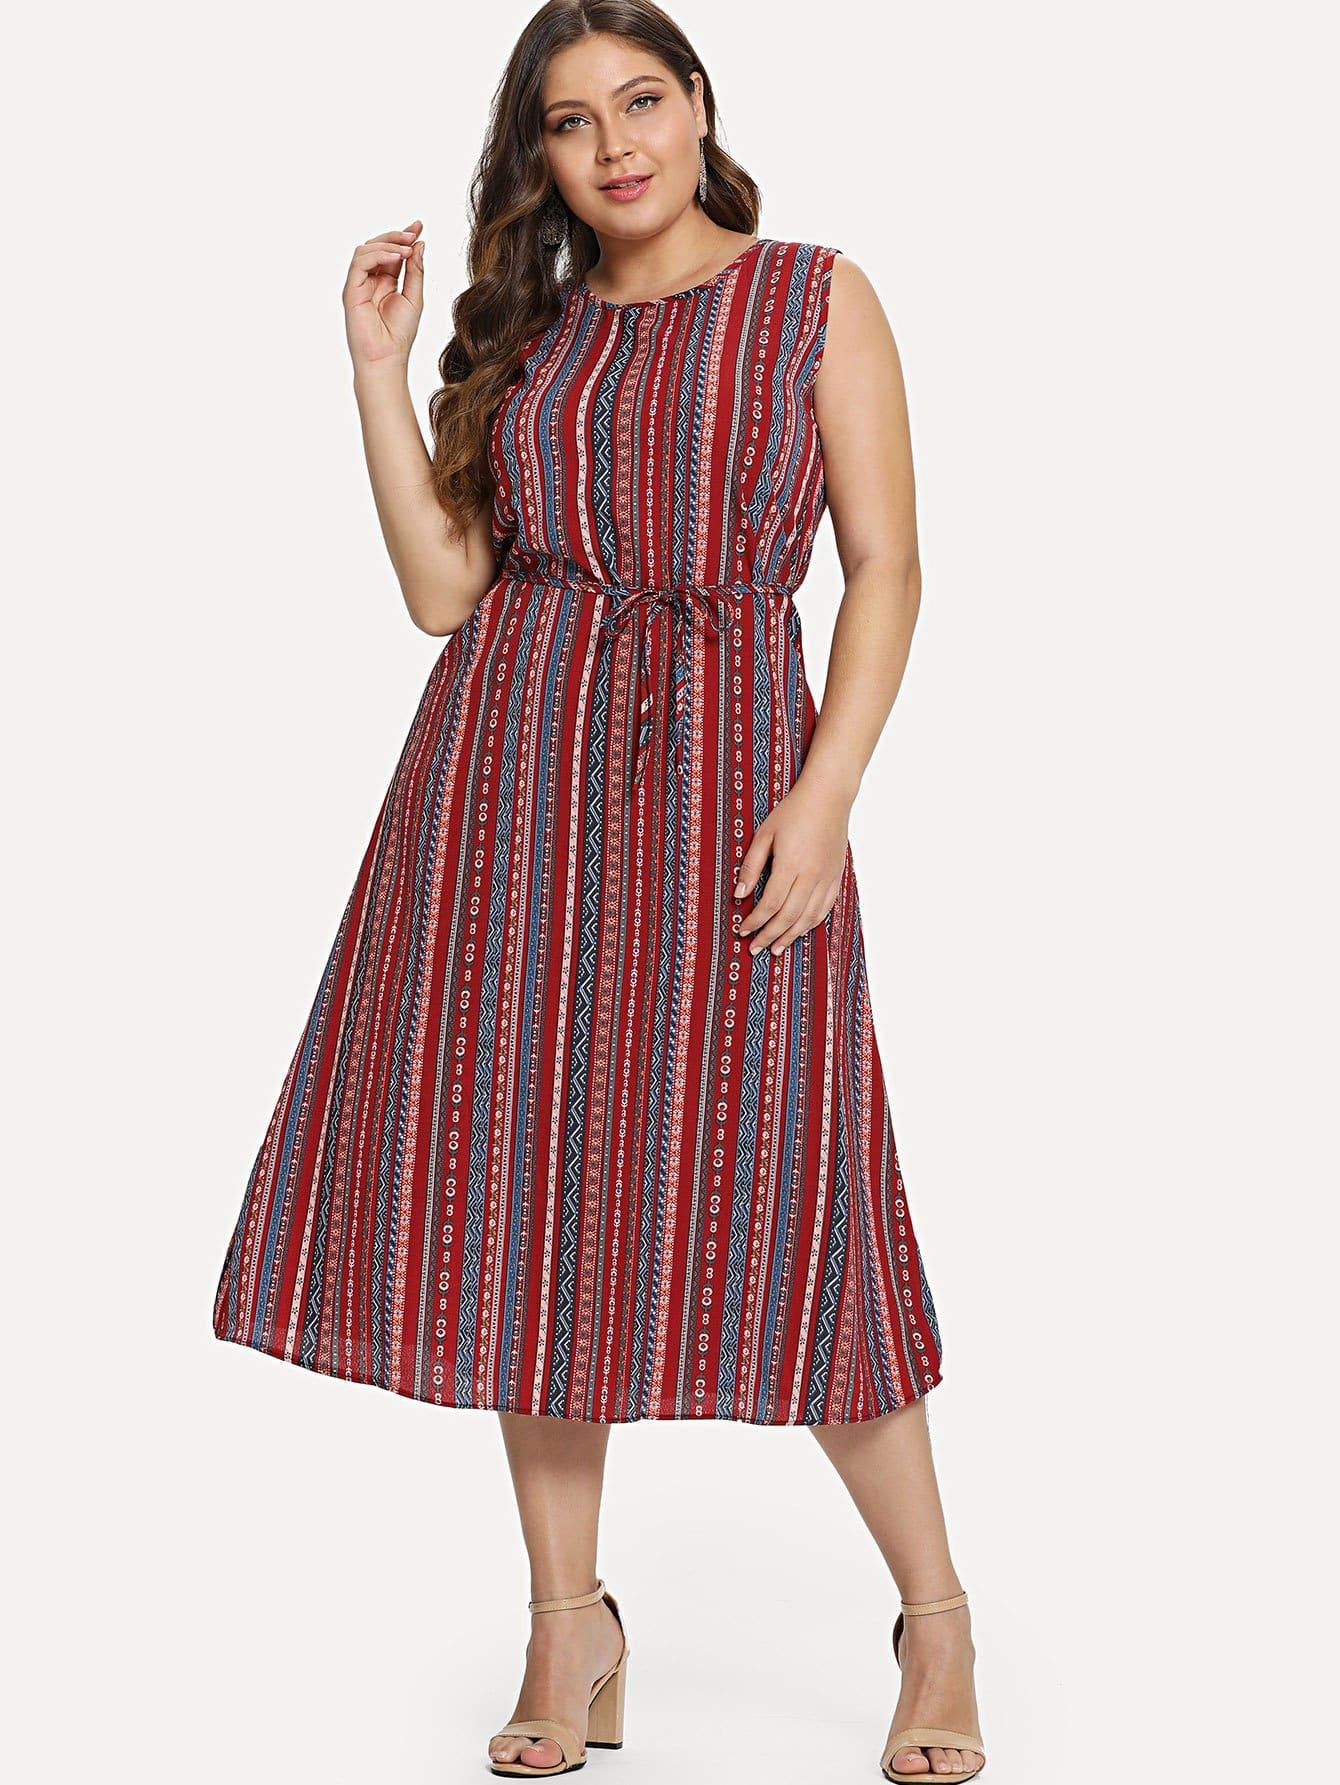 Geo Print Self Tie Dress self tie shoulder shirred bodice geo dress